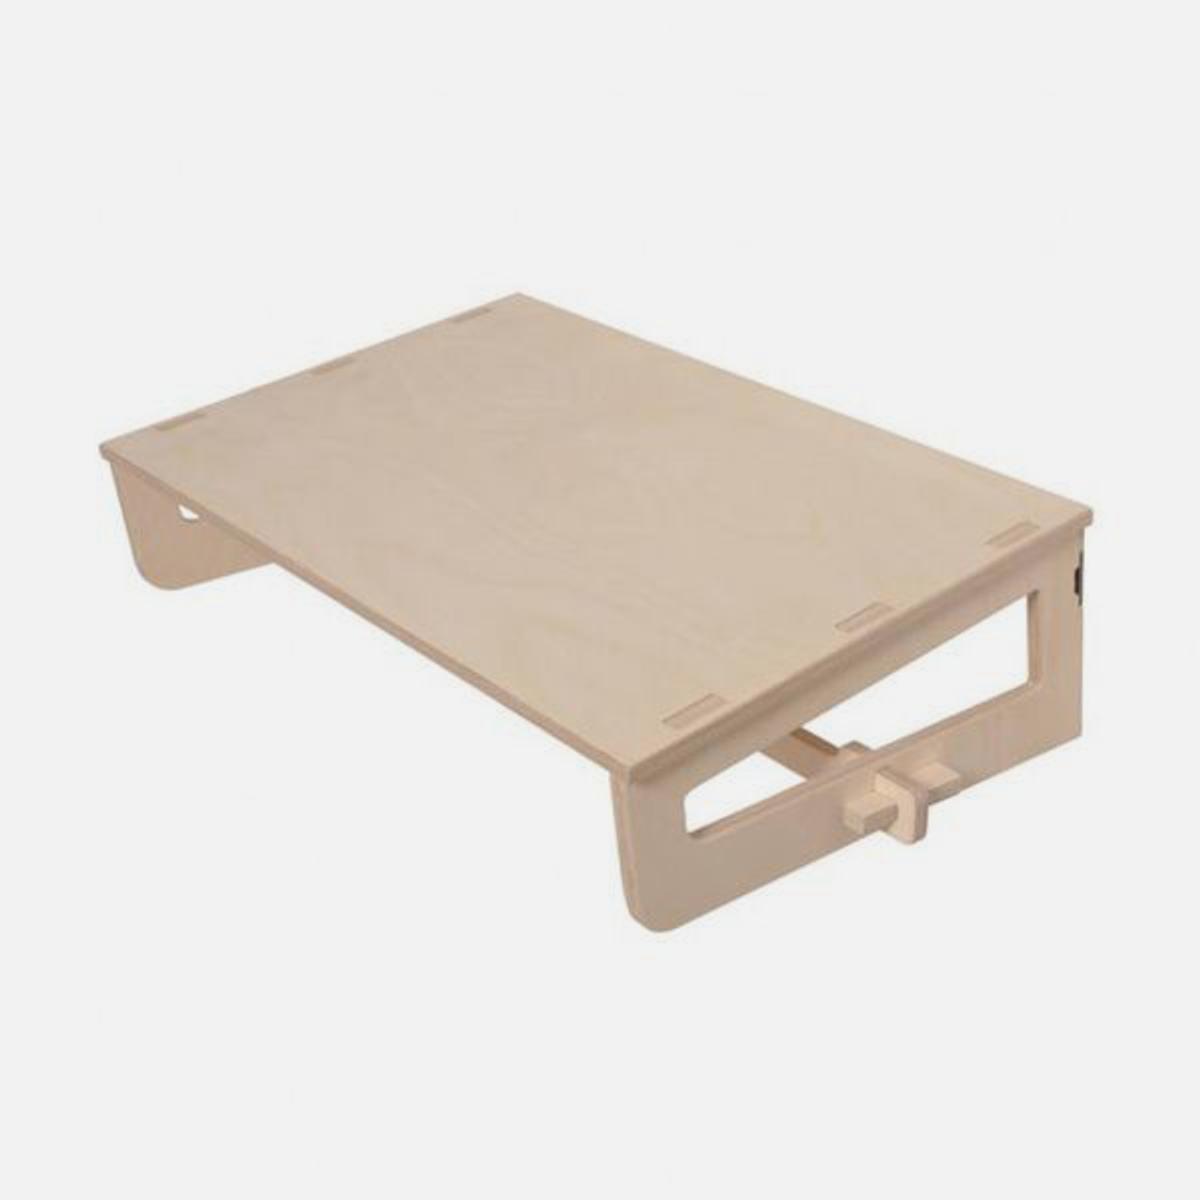 Klesheng/ hylle 1stk Play